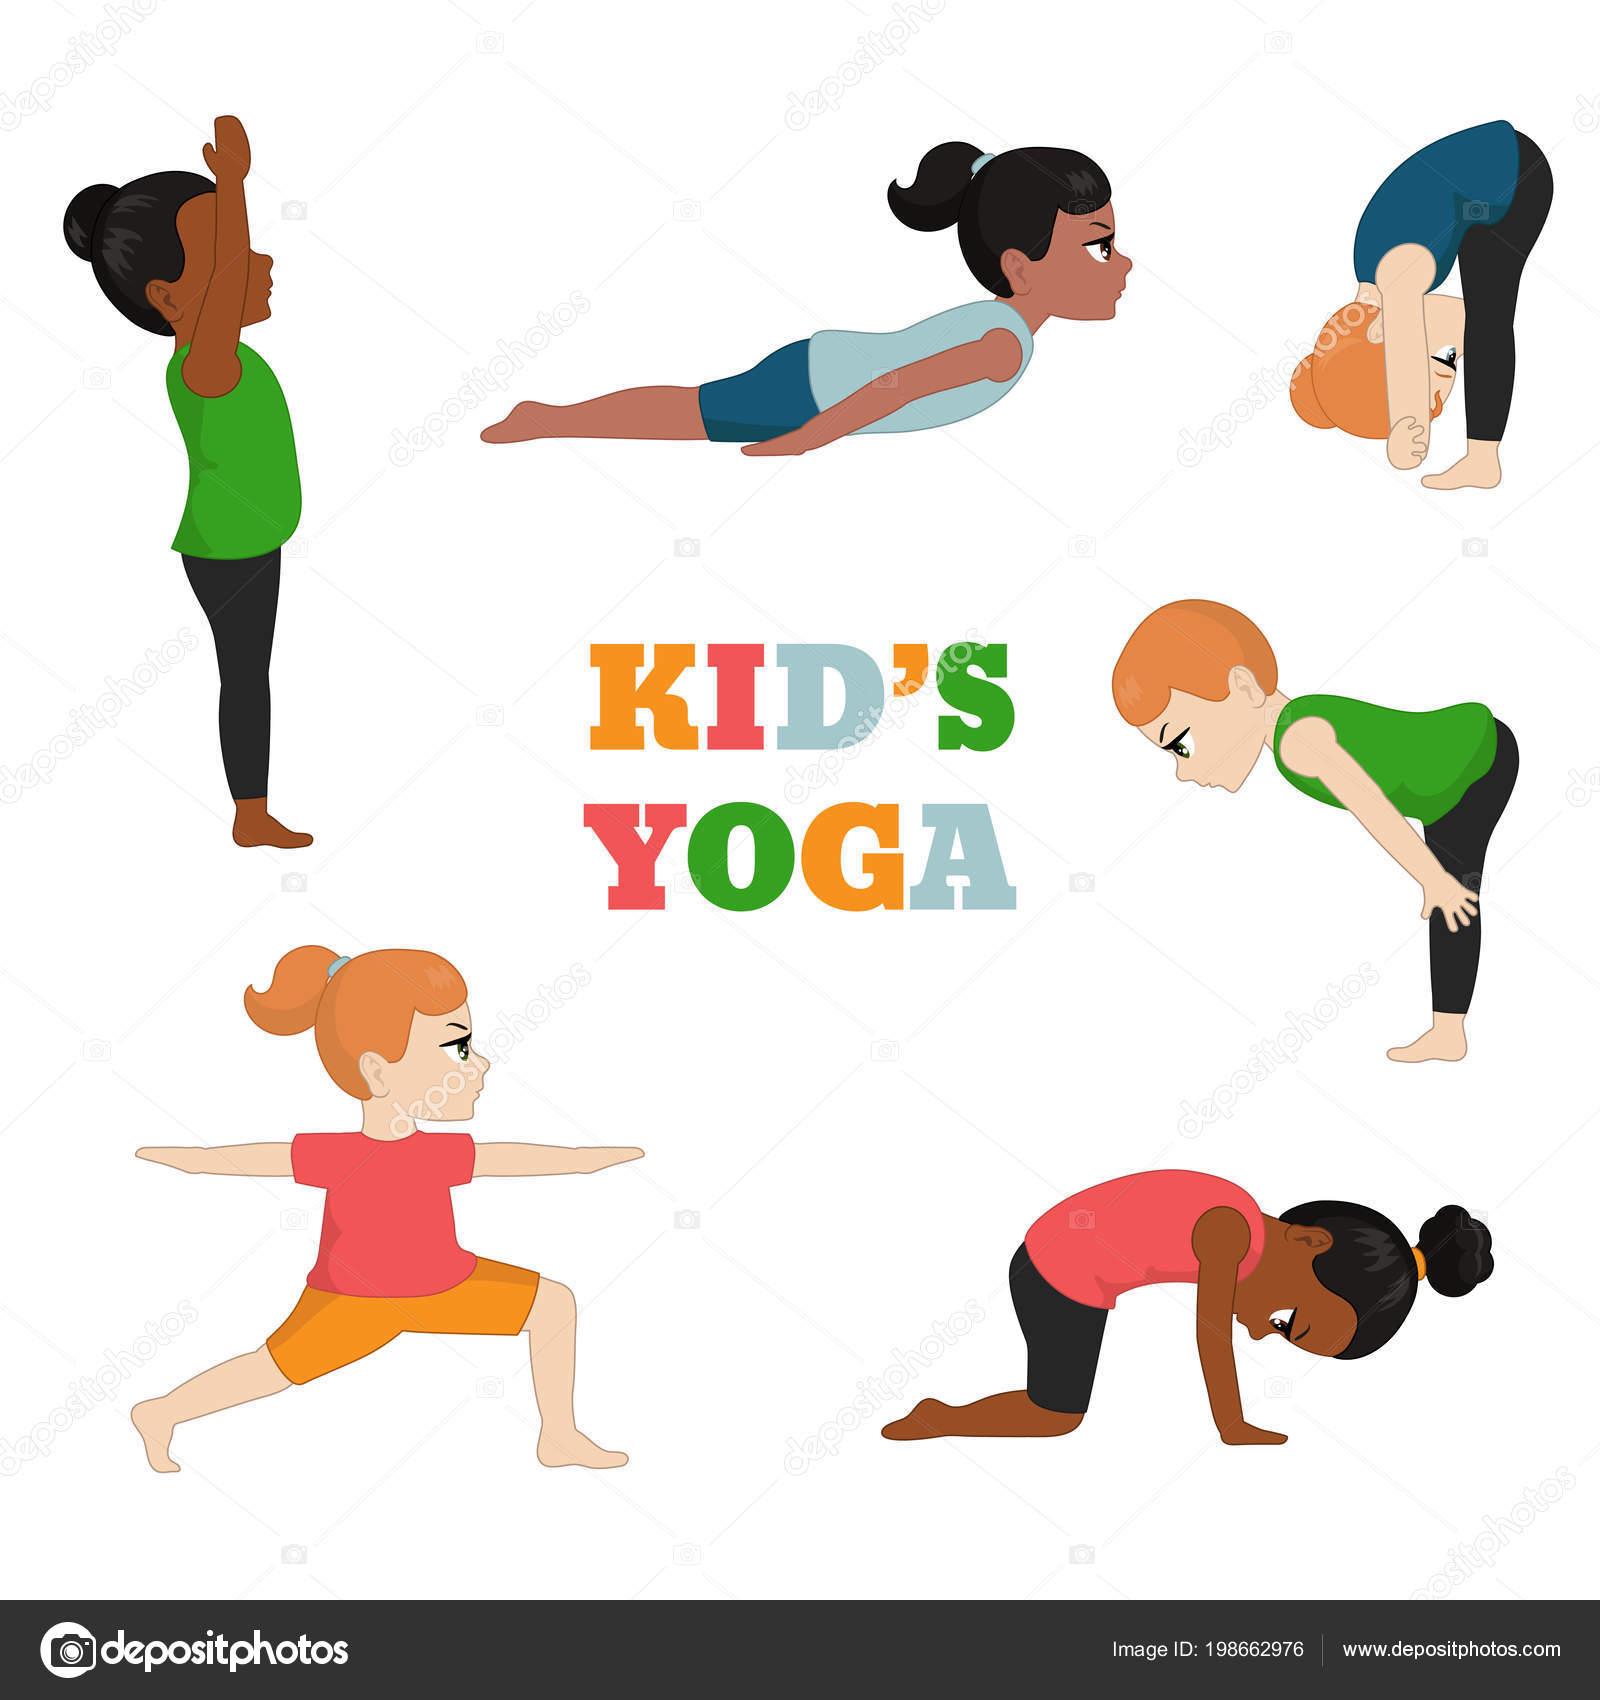 Images Healthy Lifestyle Cartoon Kids Yoga Set Healthy Lifestyle Cartoon Style Illustration Isolated White Stock Vector C Ninamunha 198662976